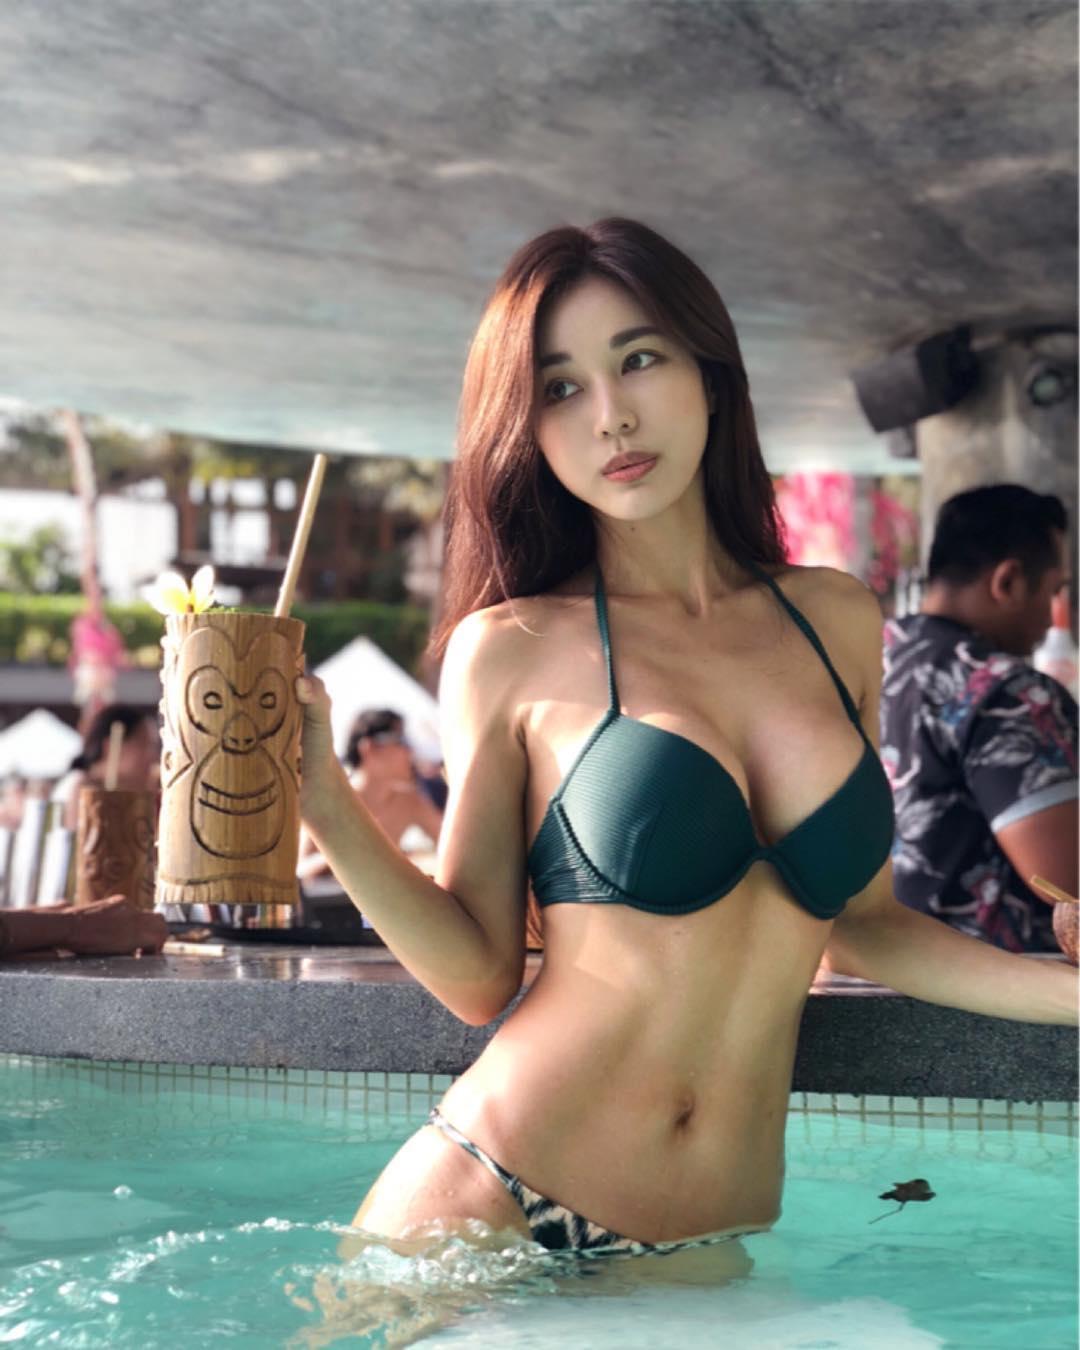 nữ dj xinh đẹp - siena mặc đồ bơi